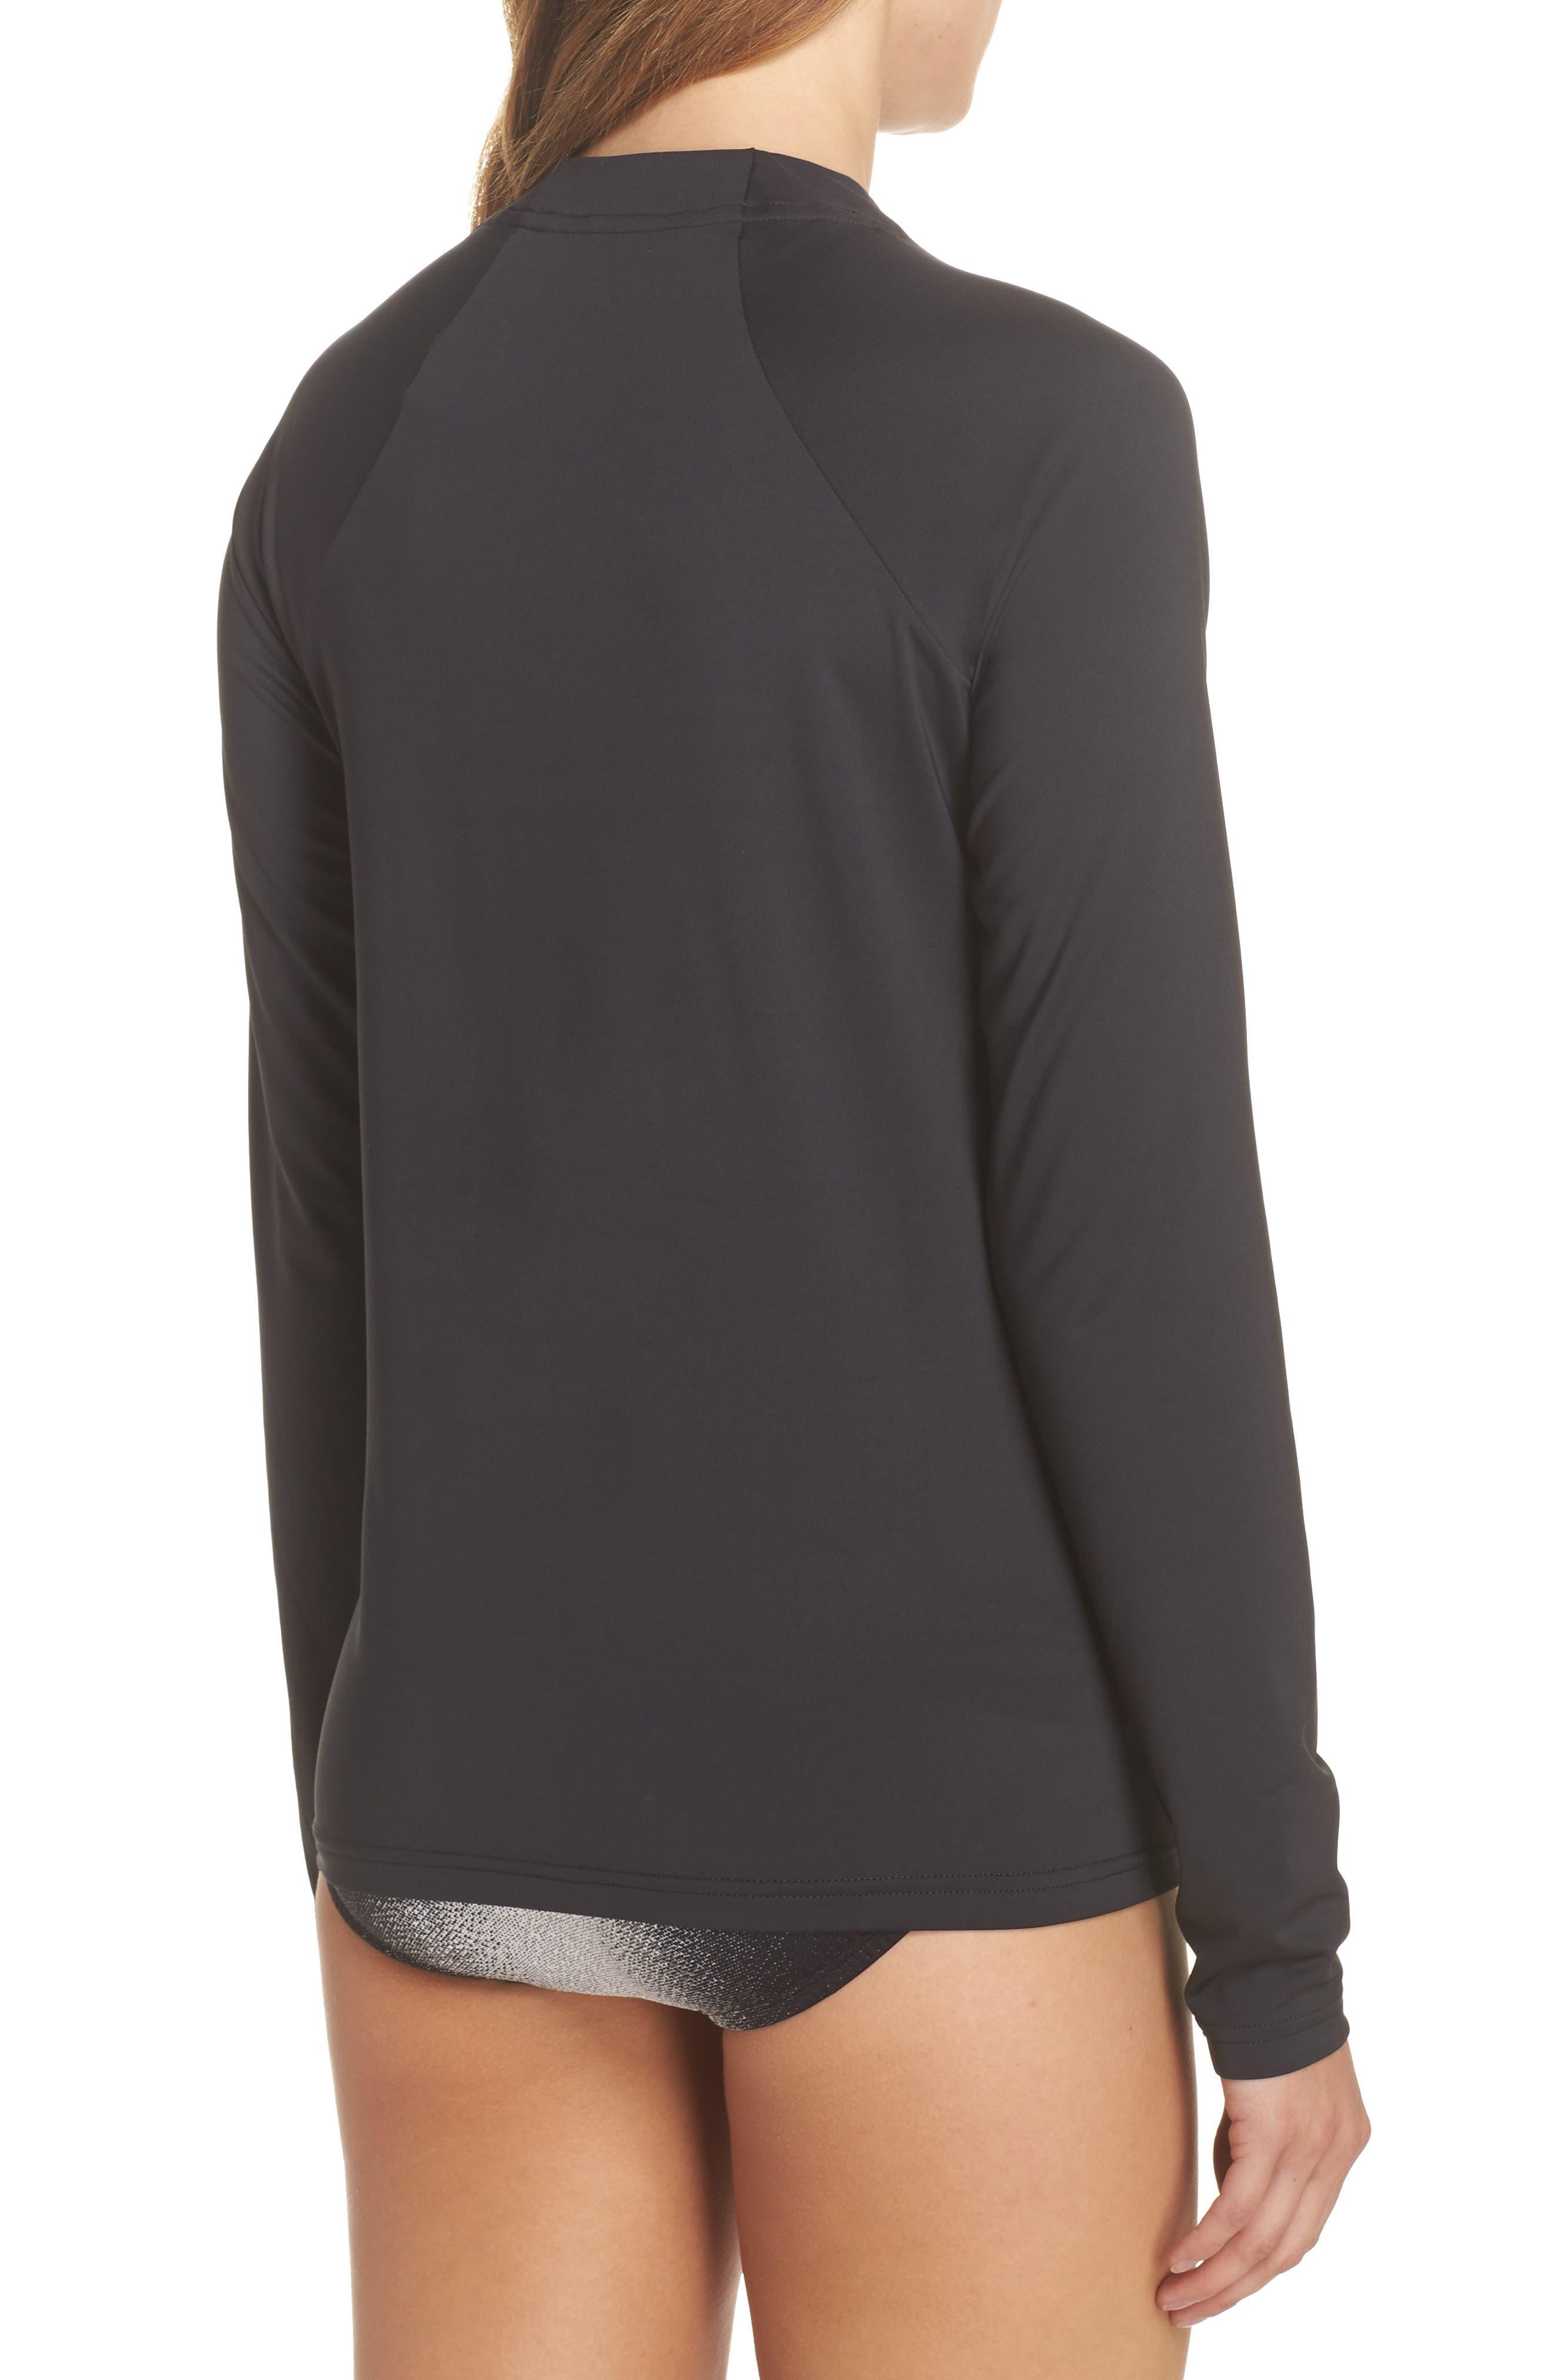 Hydroguard Surf Shirt,                             Alternate thumbnail 2, color,                             Black